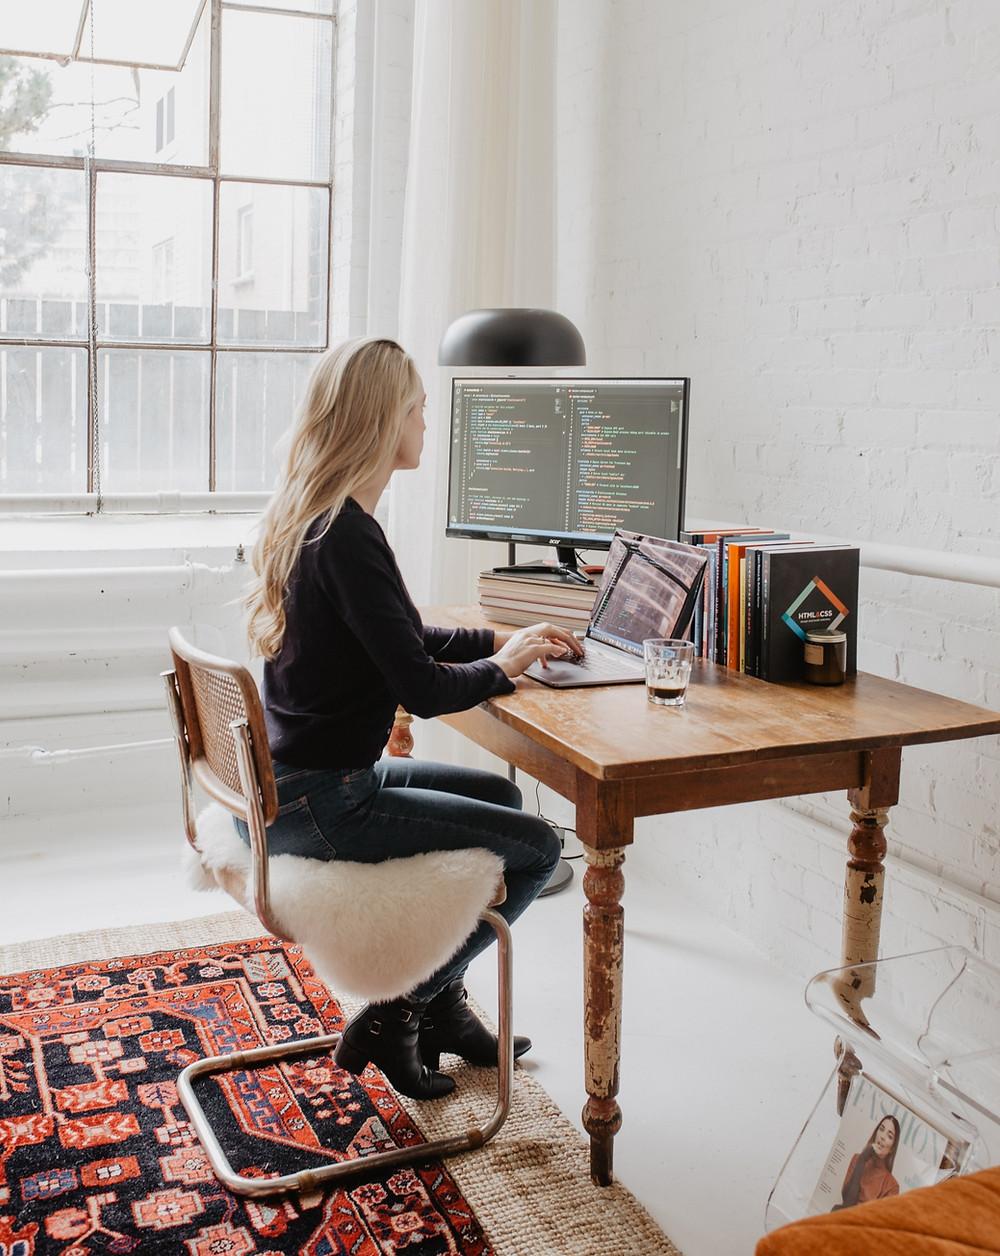 Tiff sat at her desk coding.